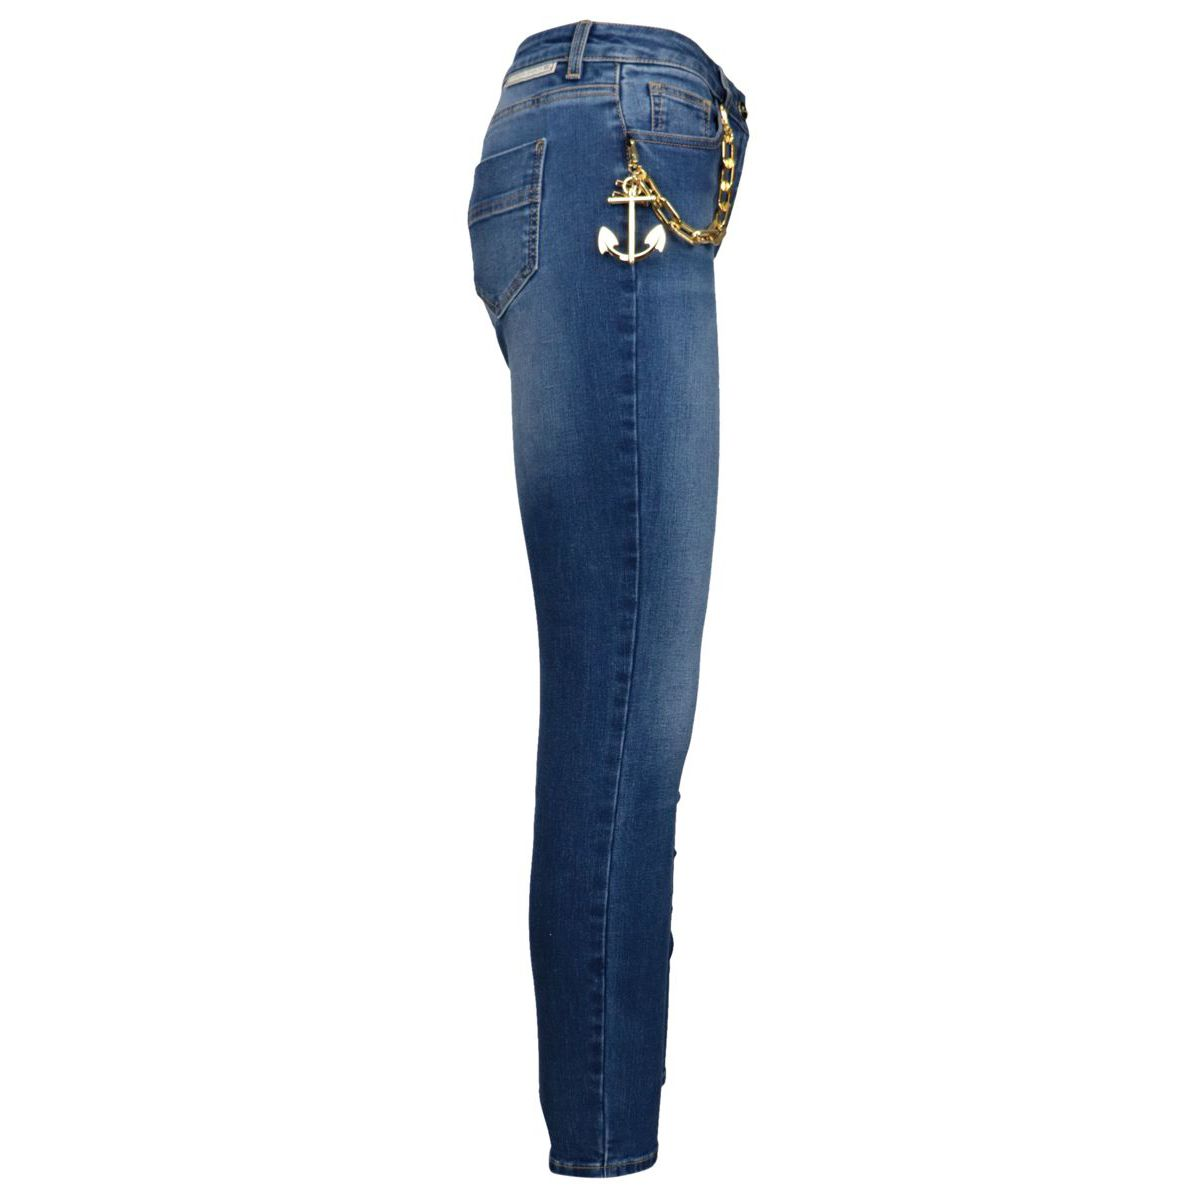 Jeans 5 tasche a vita alta con catena e charm Blu/denim Elisabetta Franchi